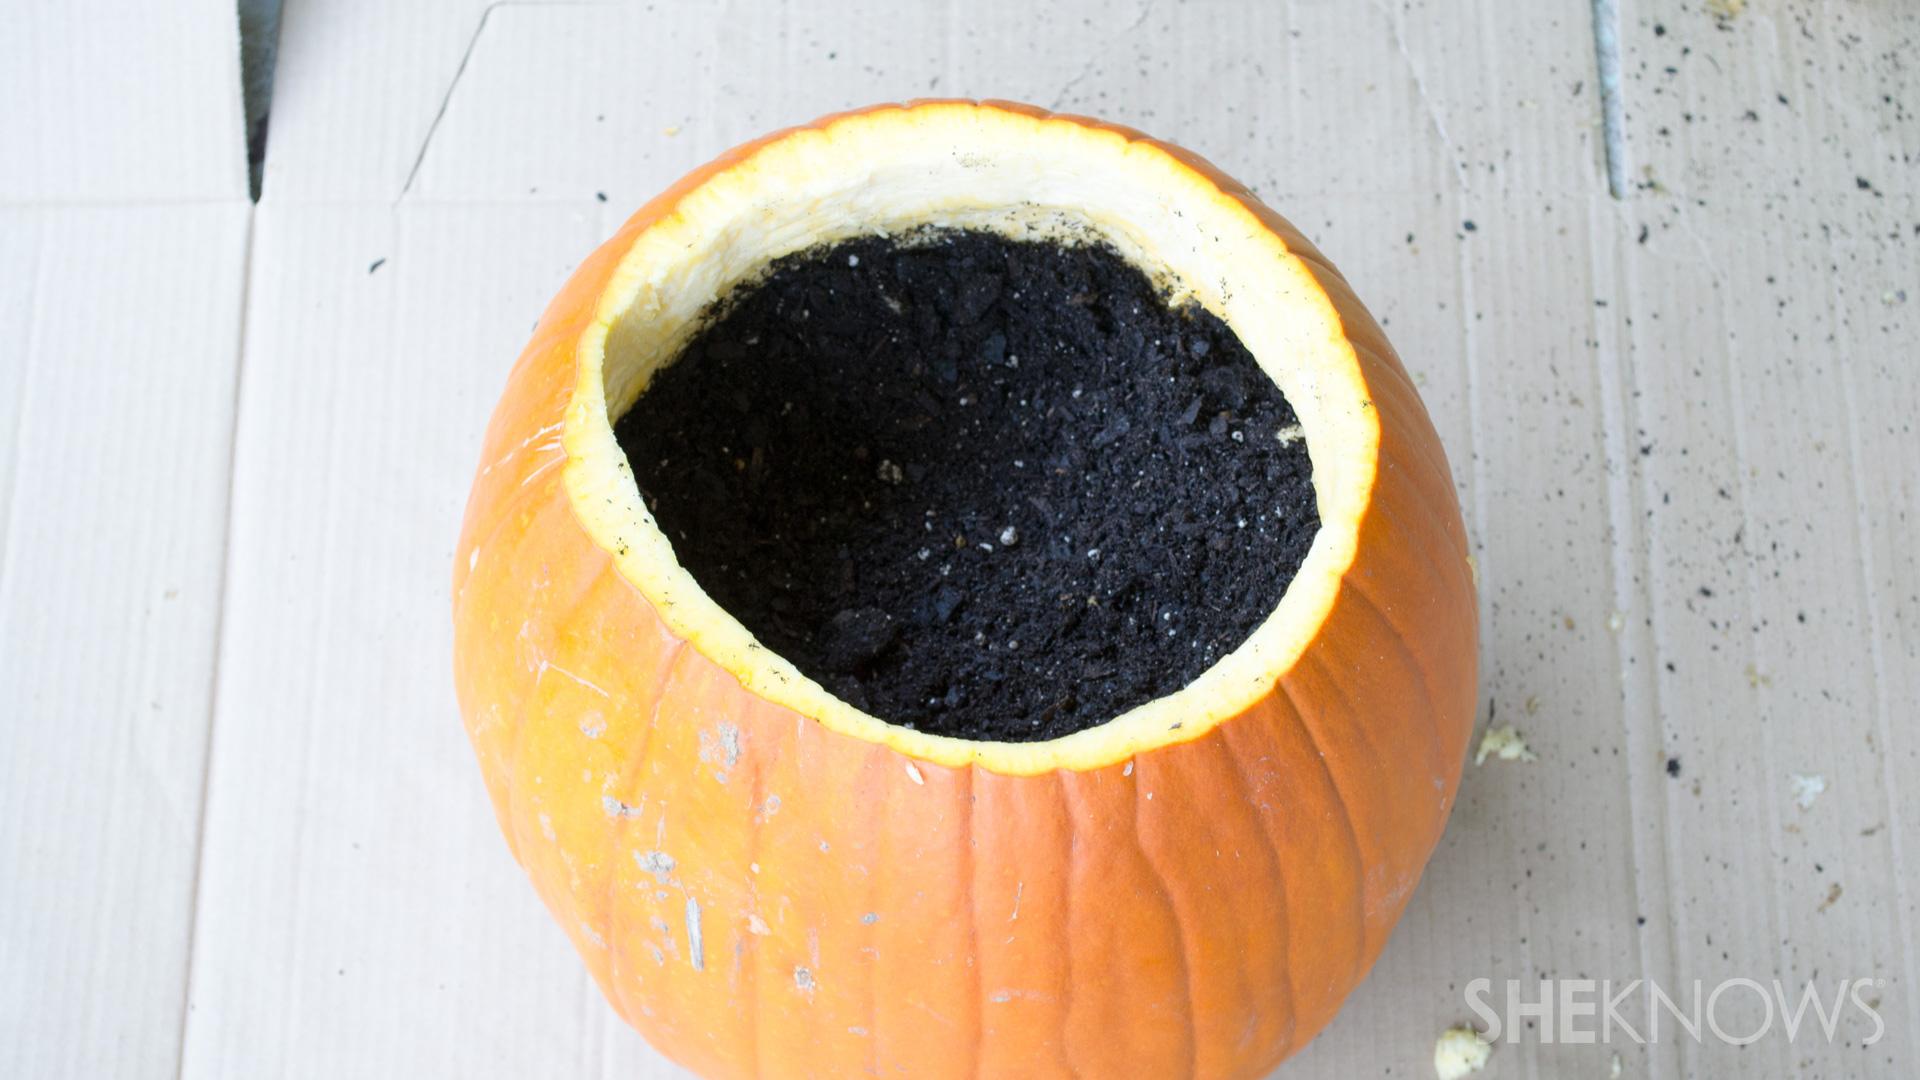 DIY Pumpkin planter: Fill with soil